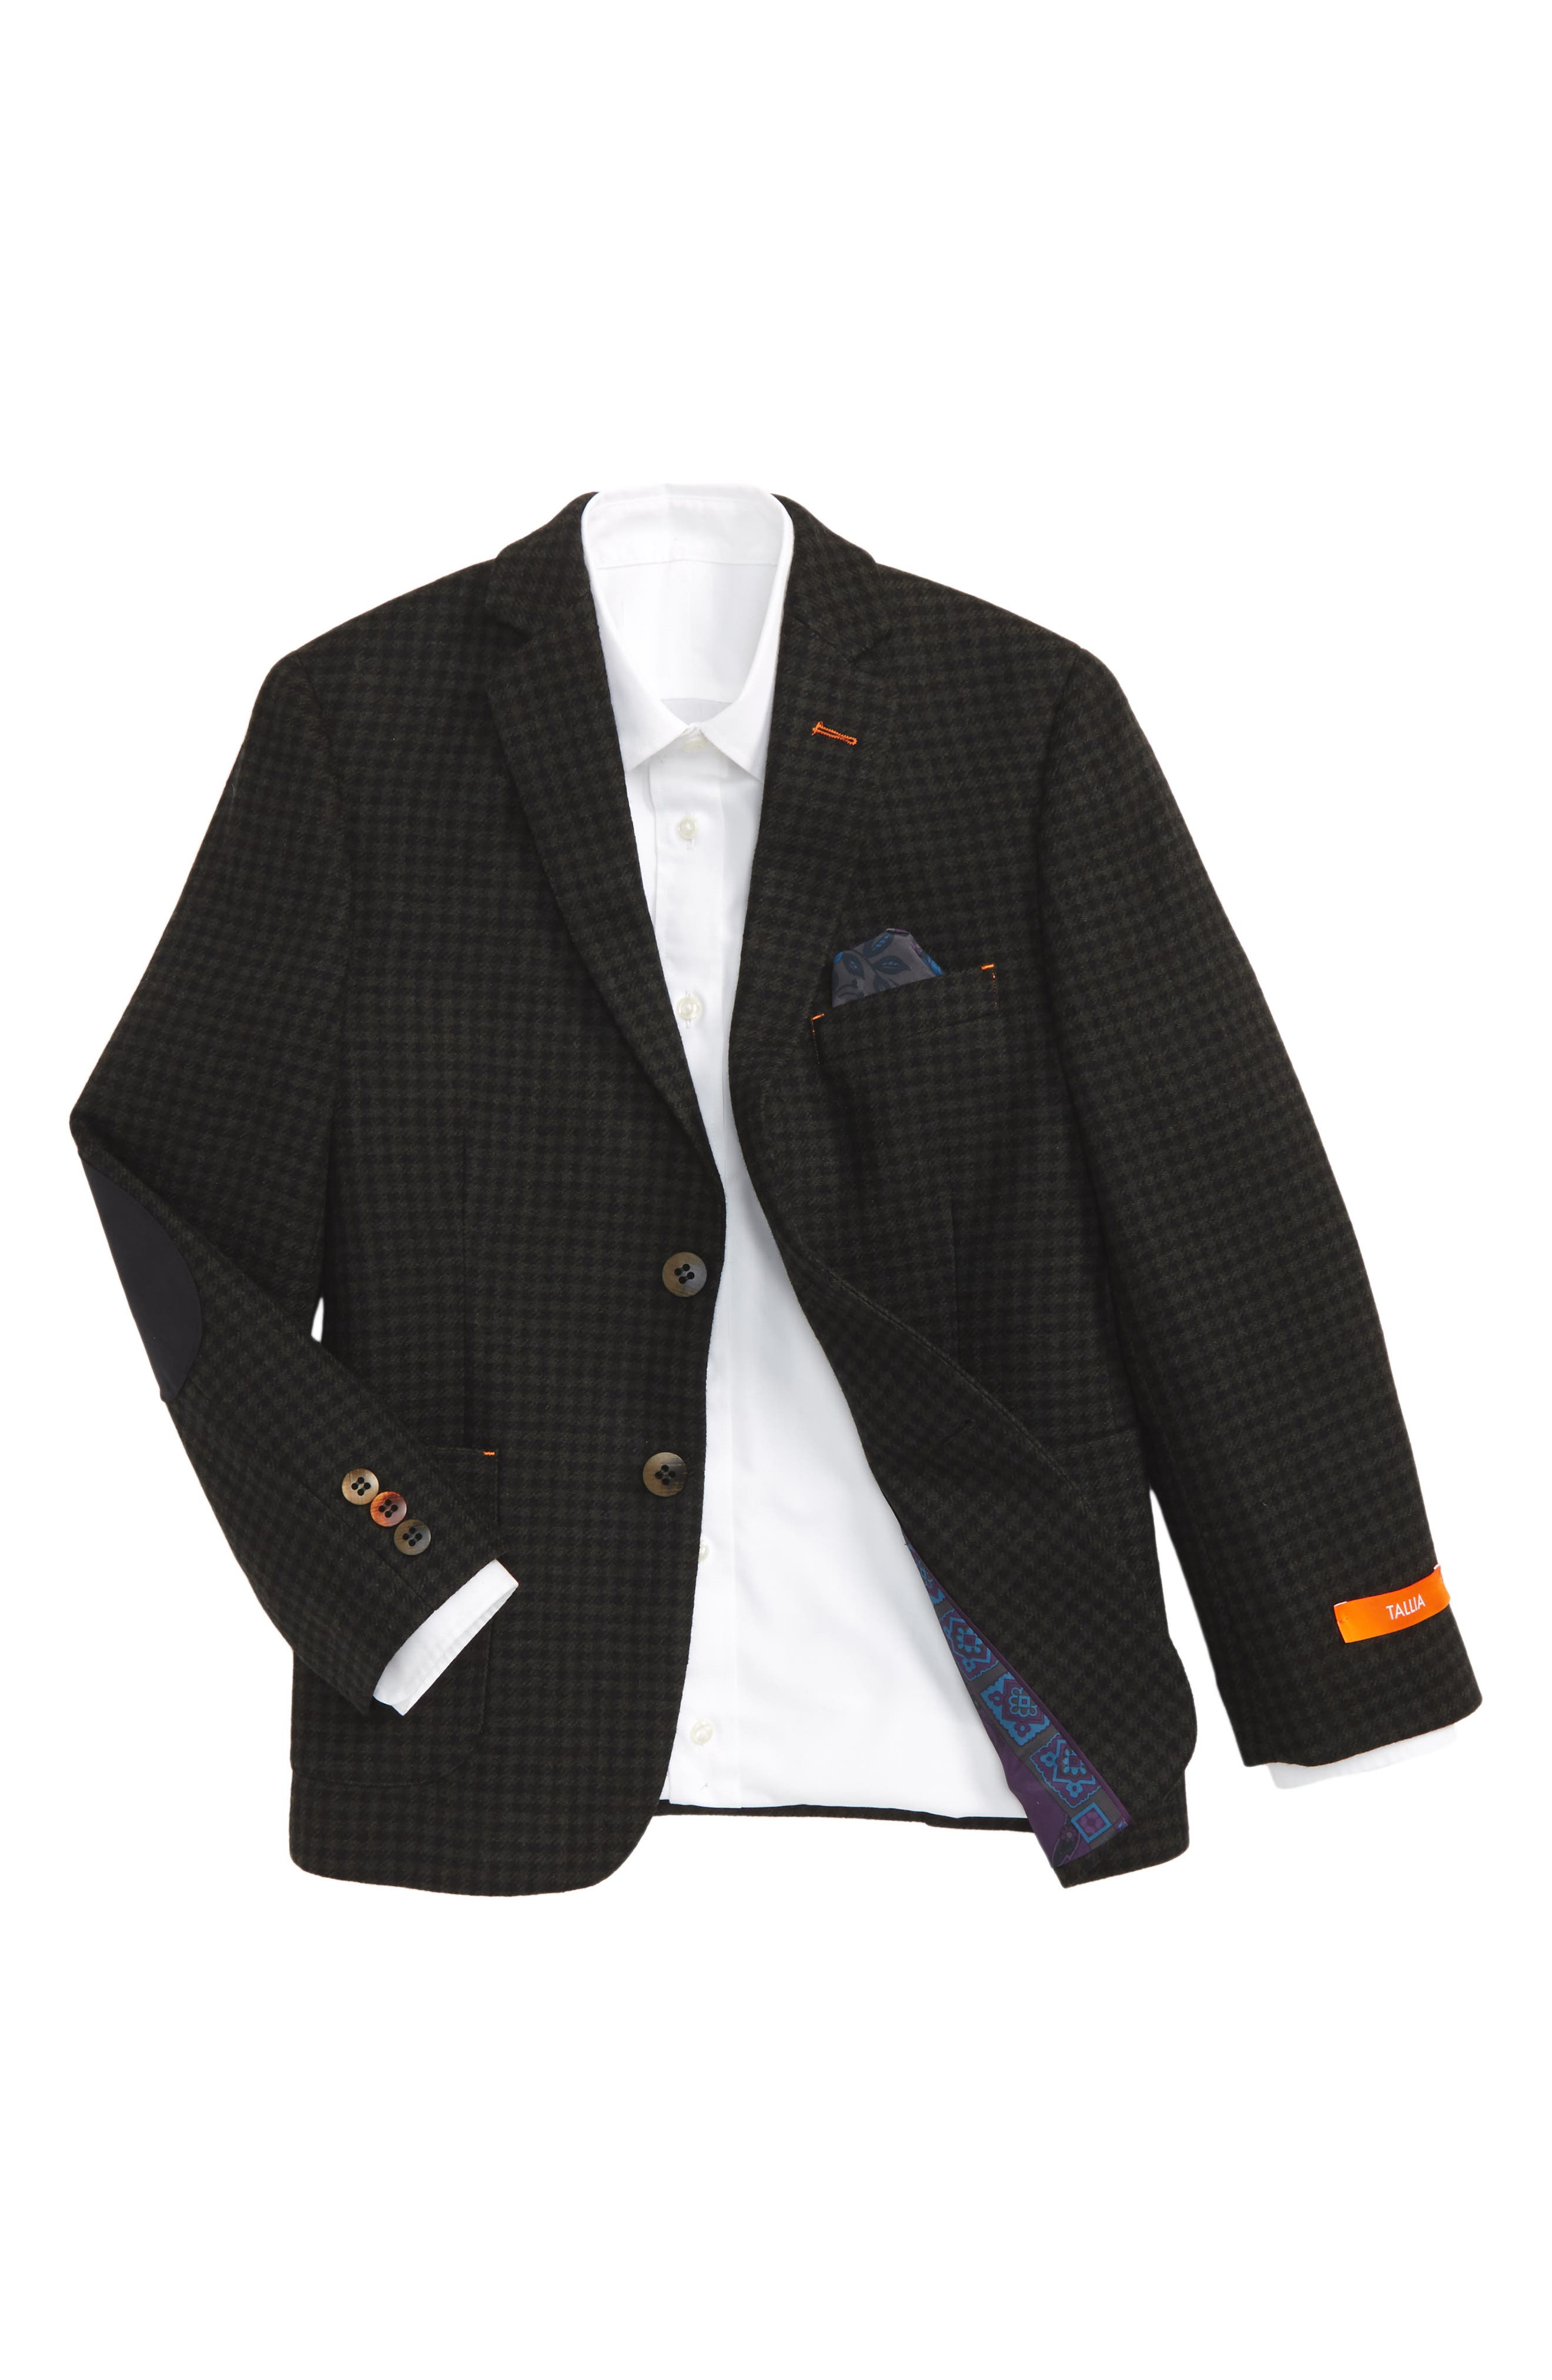 Alternate Image 1 Selected - Tallia Herringbone Wool Sport Coat (Big Boys)